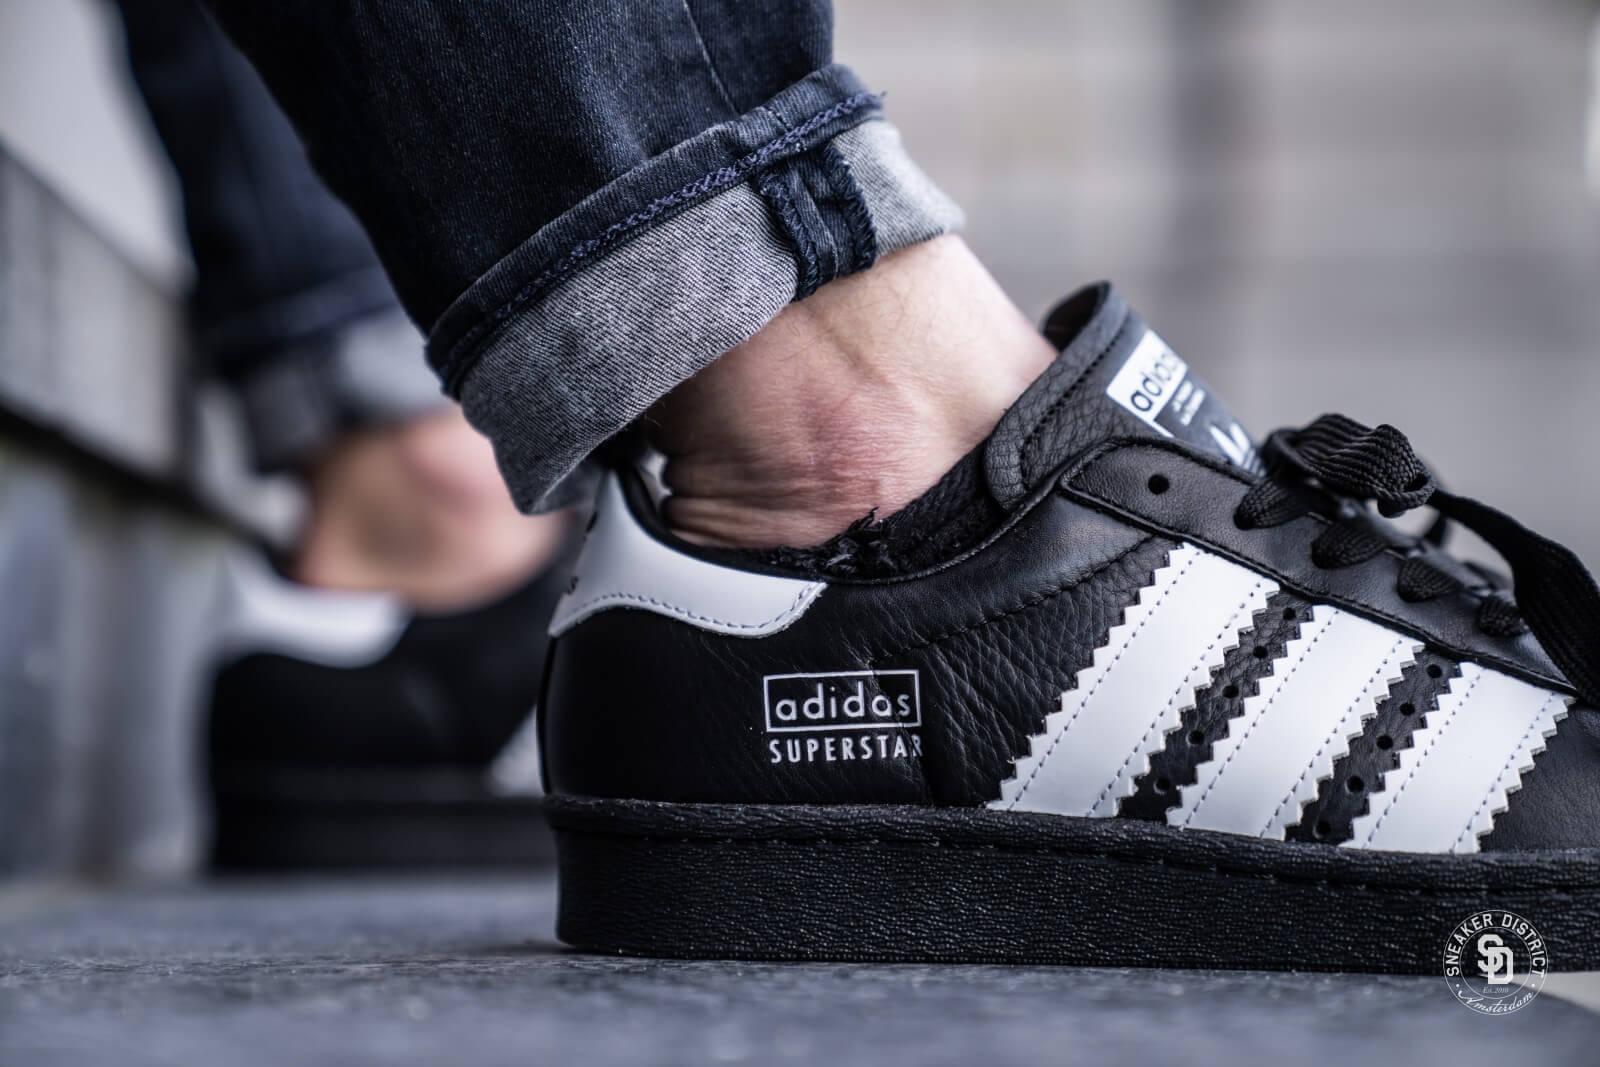 Adidas Superstar 80s Core Black/Footwear White